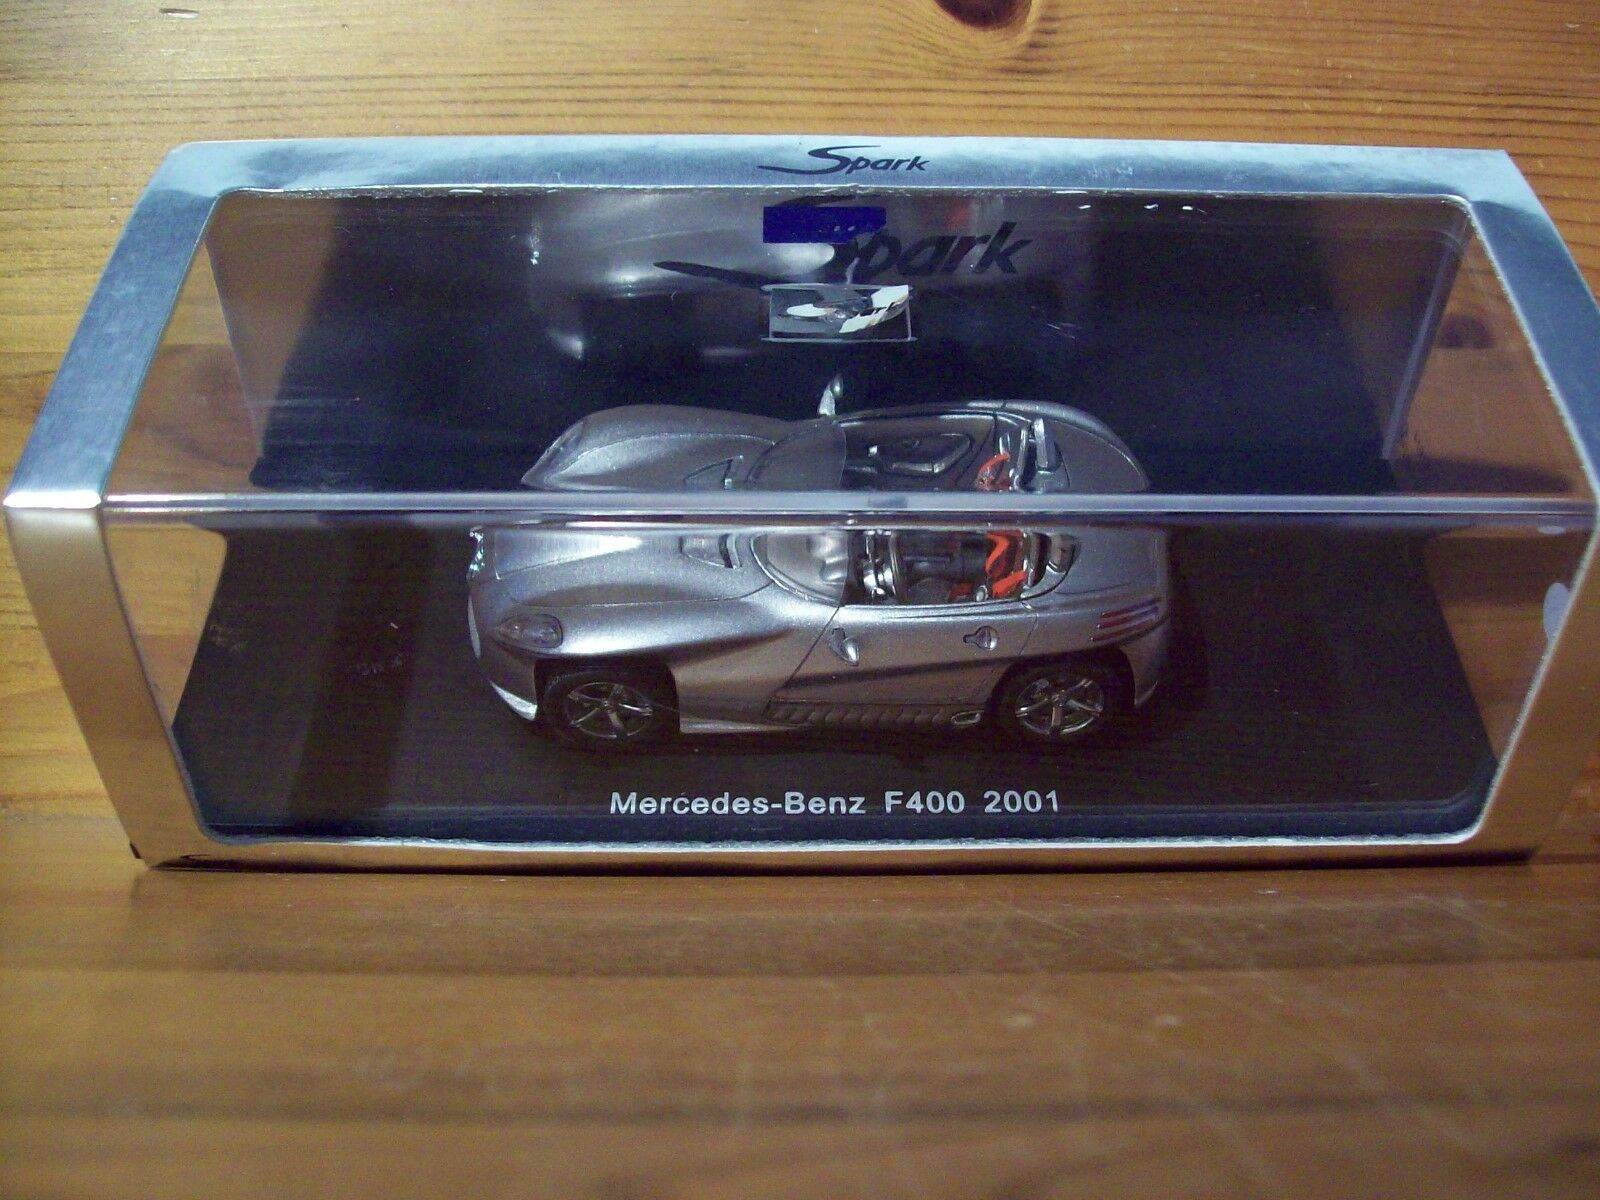 1 43 SPARK S1014 MERCEDES-BENZ F400 2001